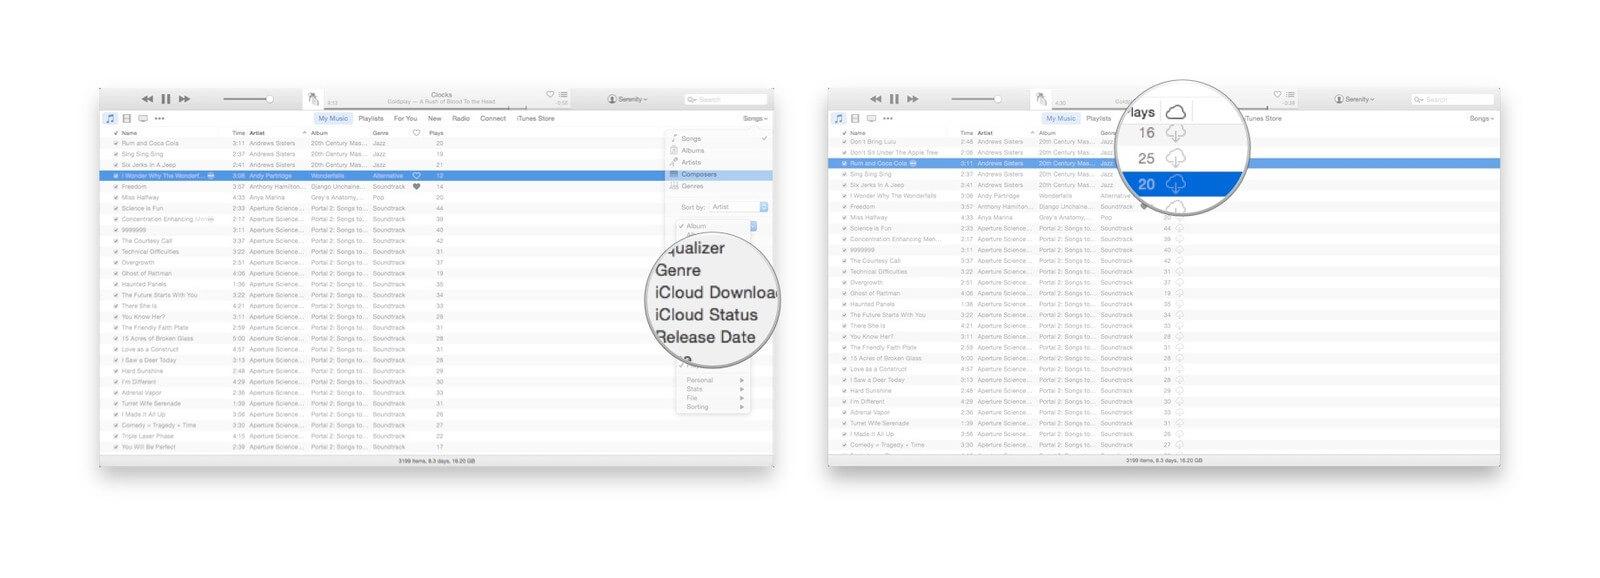 apple music view offline songs mac part 2